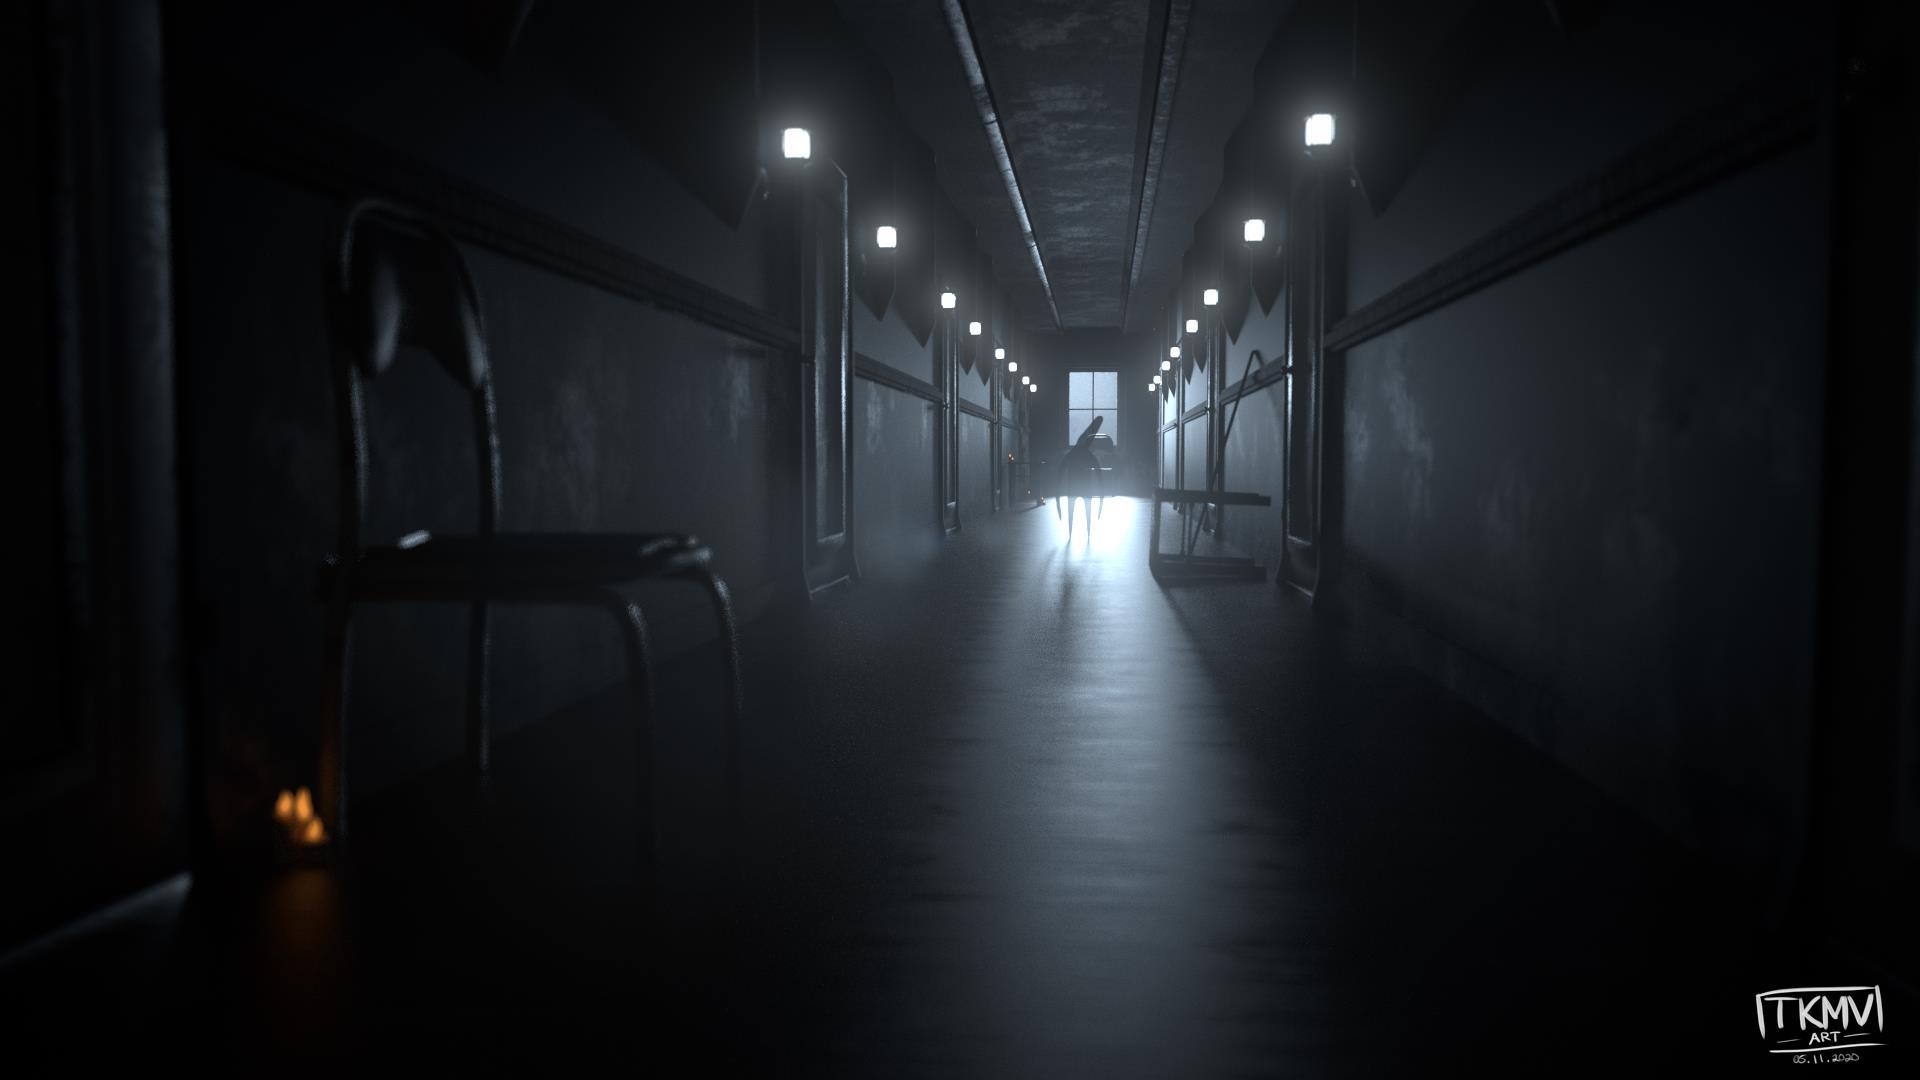 TKMV Creepy Crazy Hallway